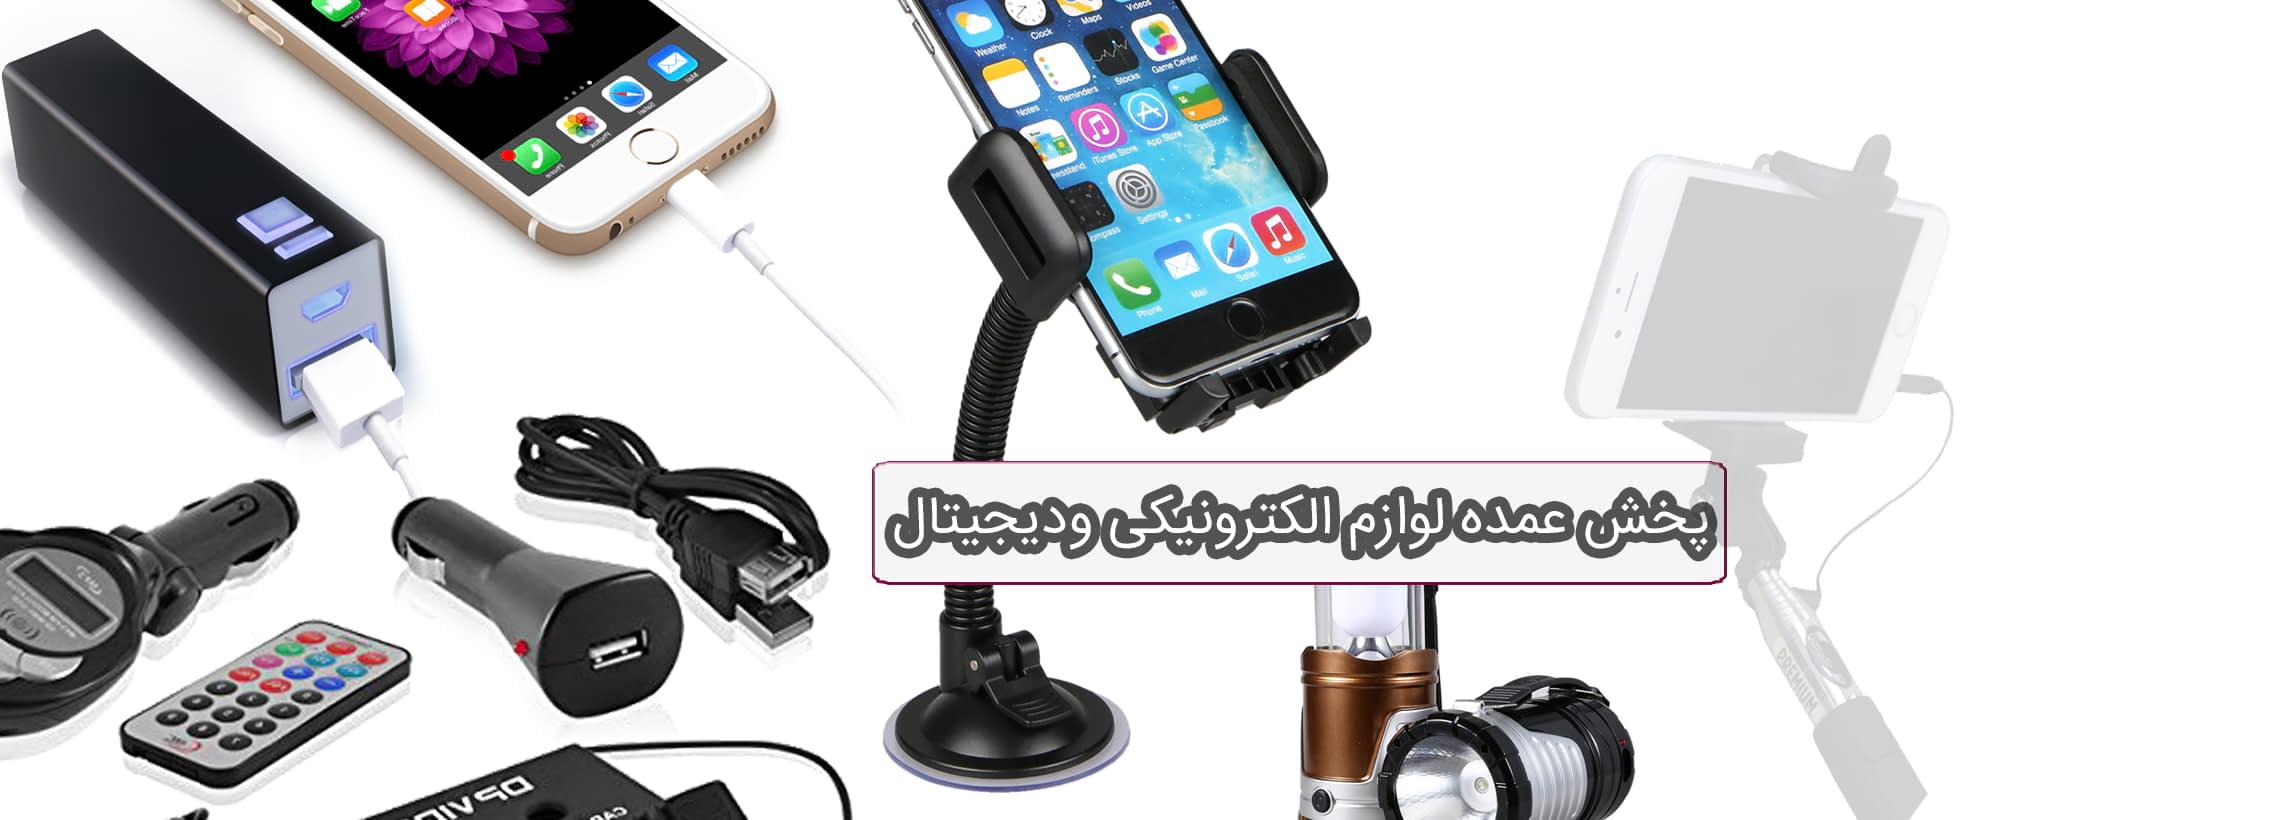 پخش عمده لوازم الکترونیکی و دیجیتال صالح آباد